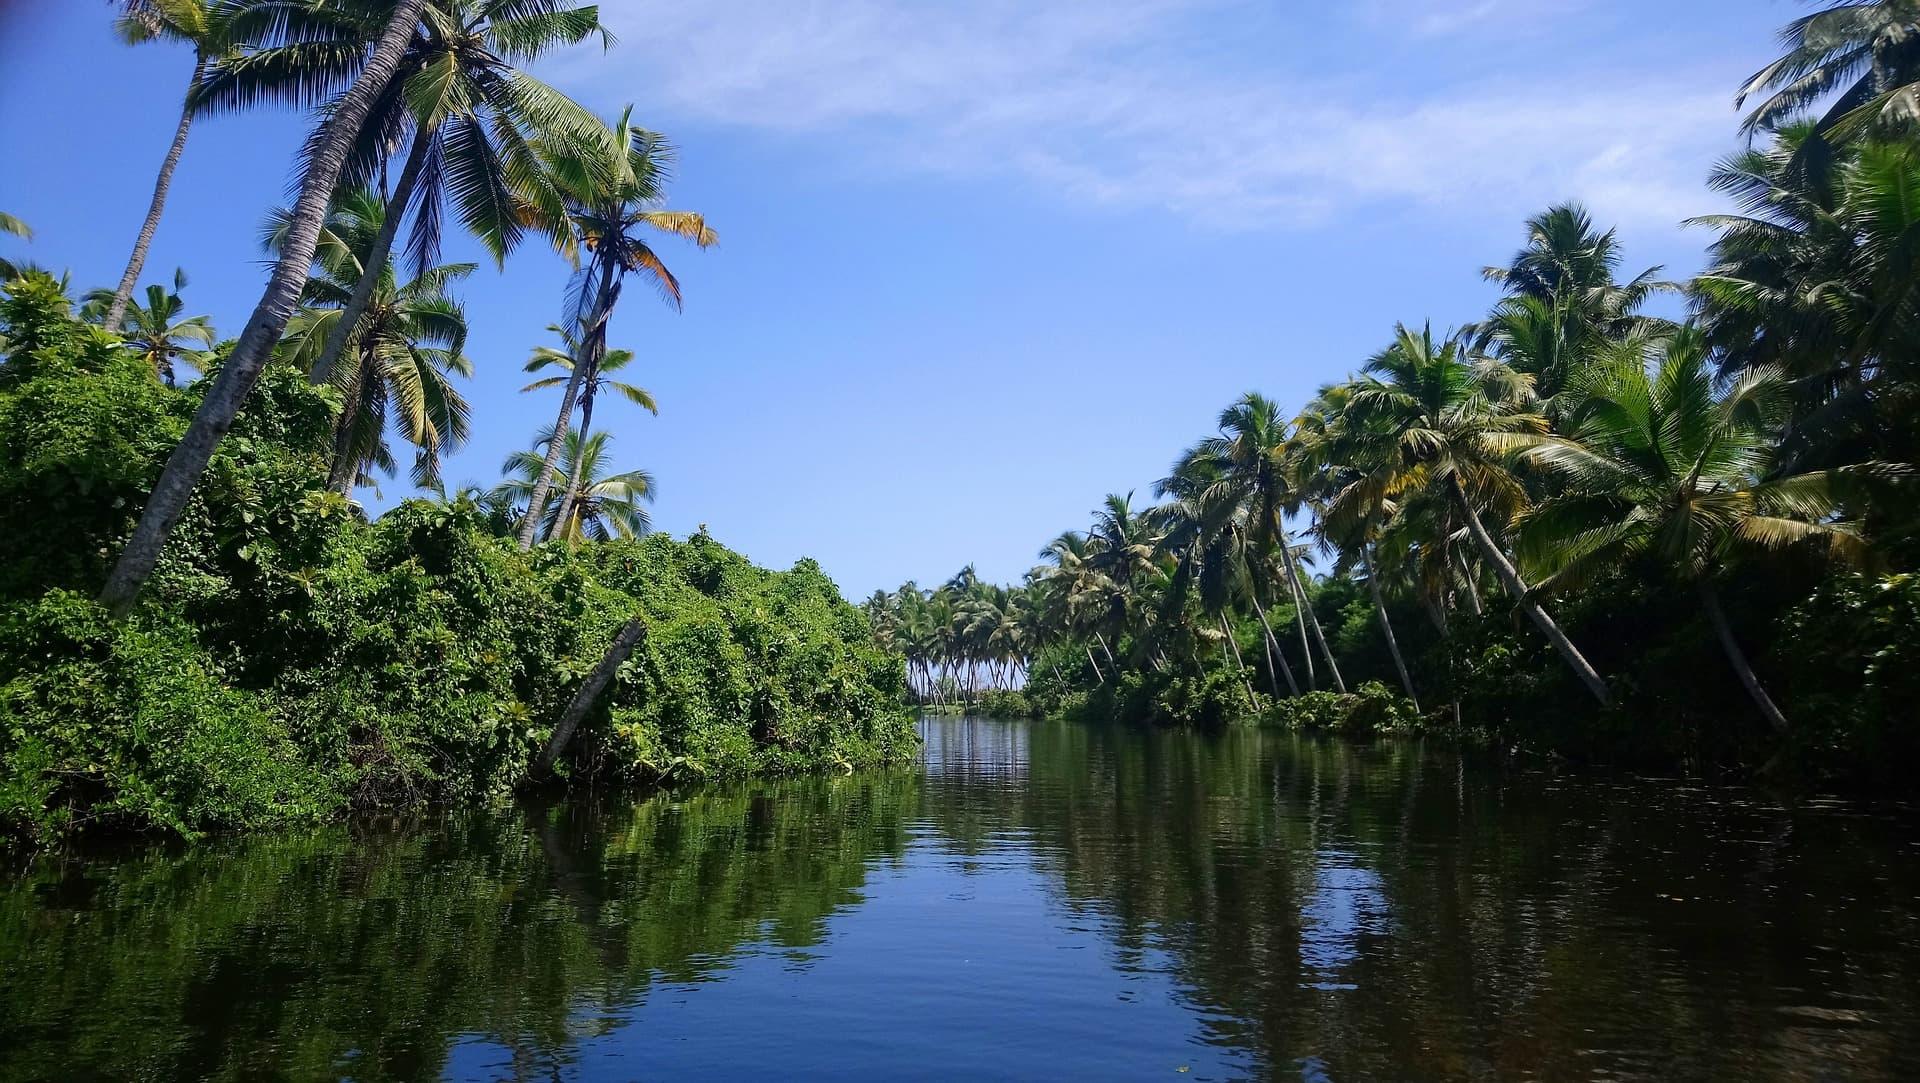 adventour - India - Kerala backwaters trees